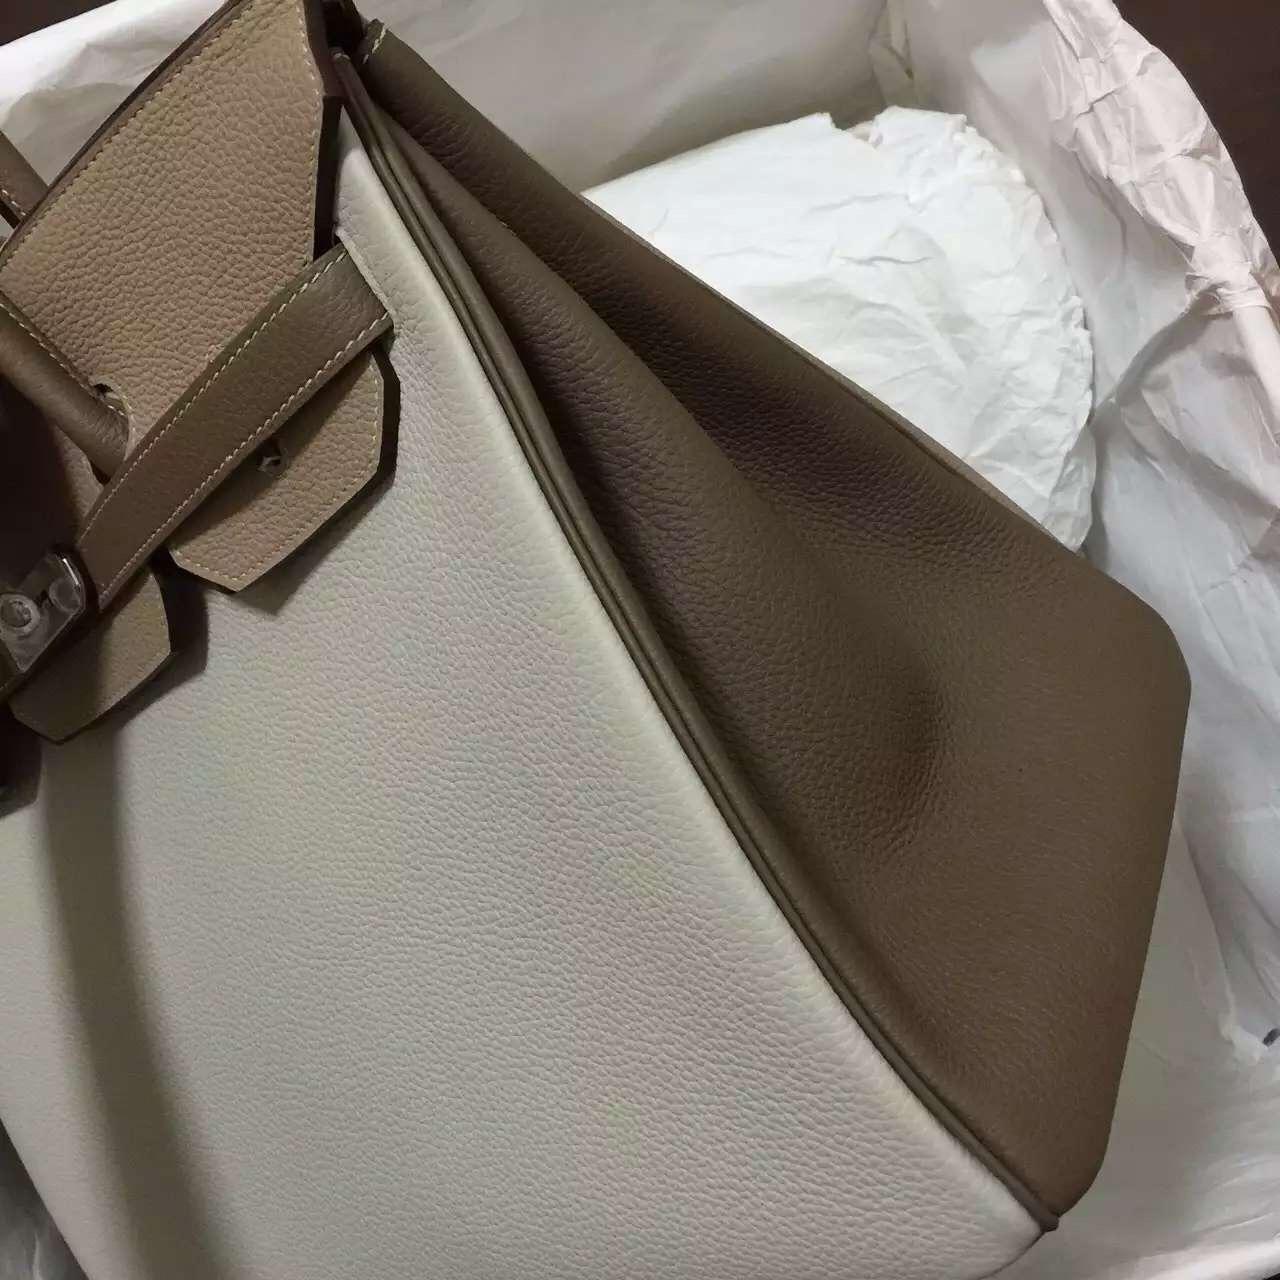 Wholesale Hermes Birkin 35CM Colorblock Togo Leather Women's Tote Silver Hardware